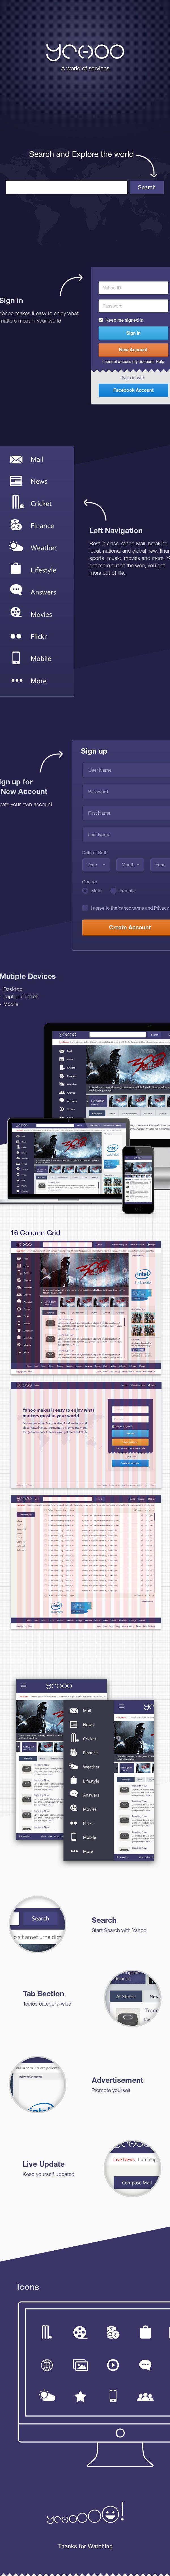 Yahoo Redesign by Mani Bharathi, via Behance